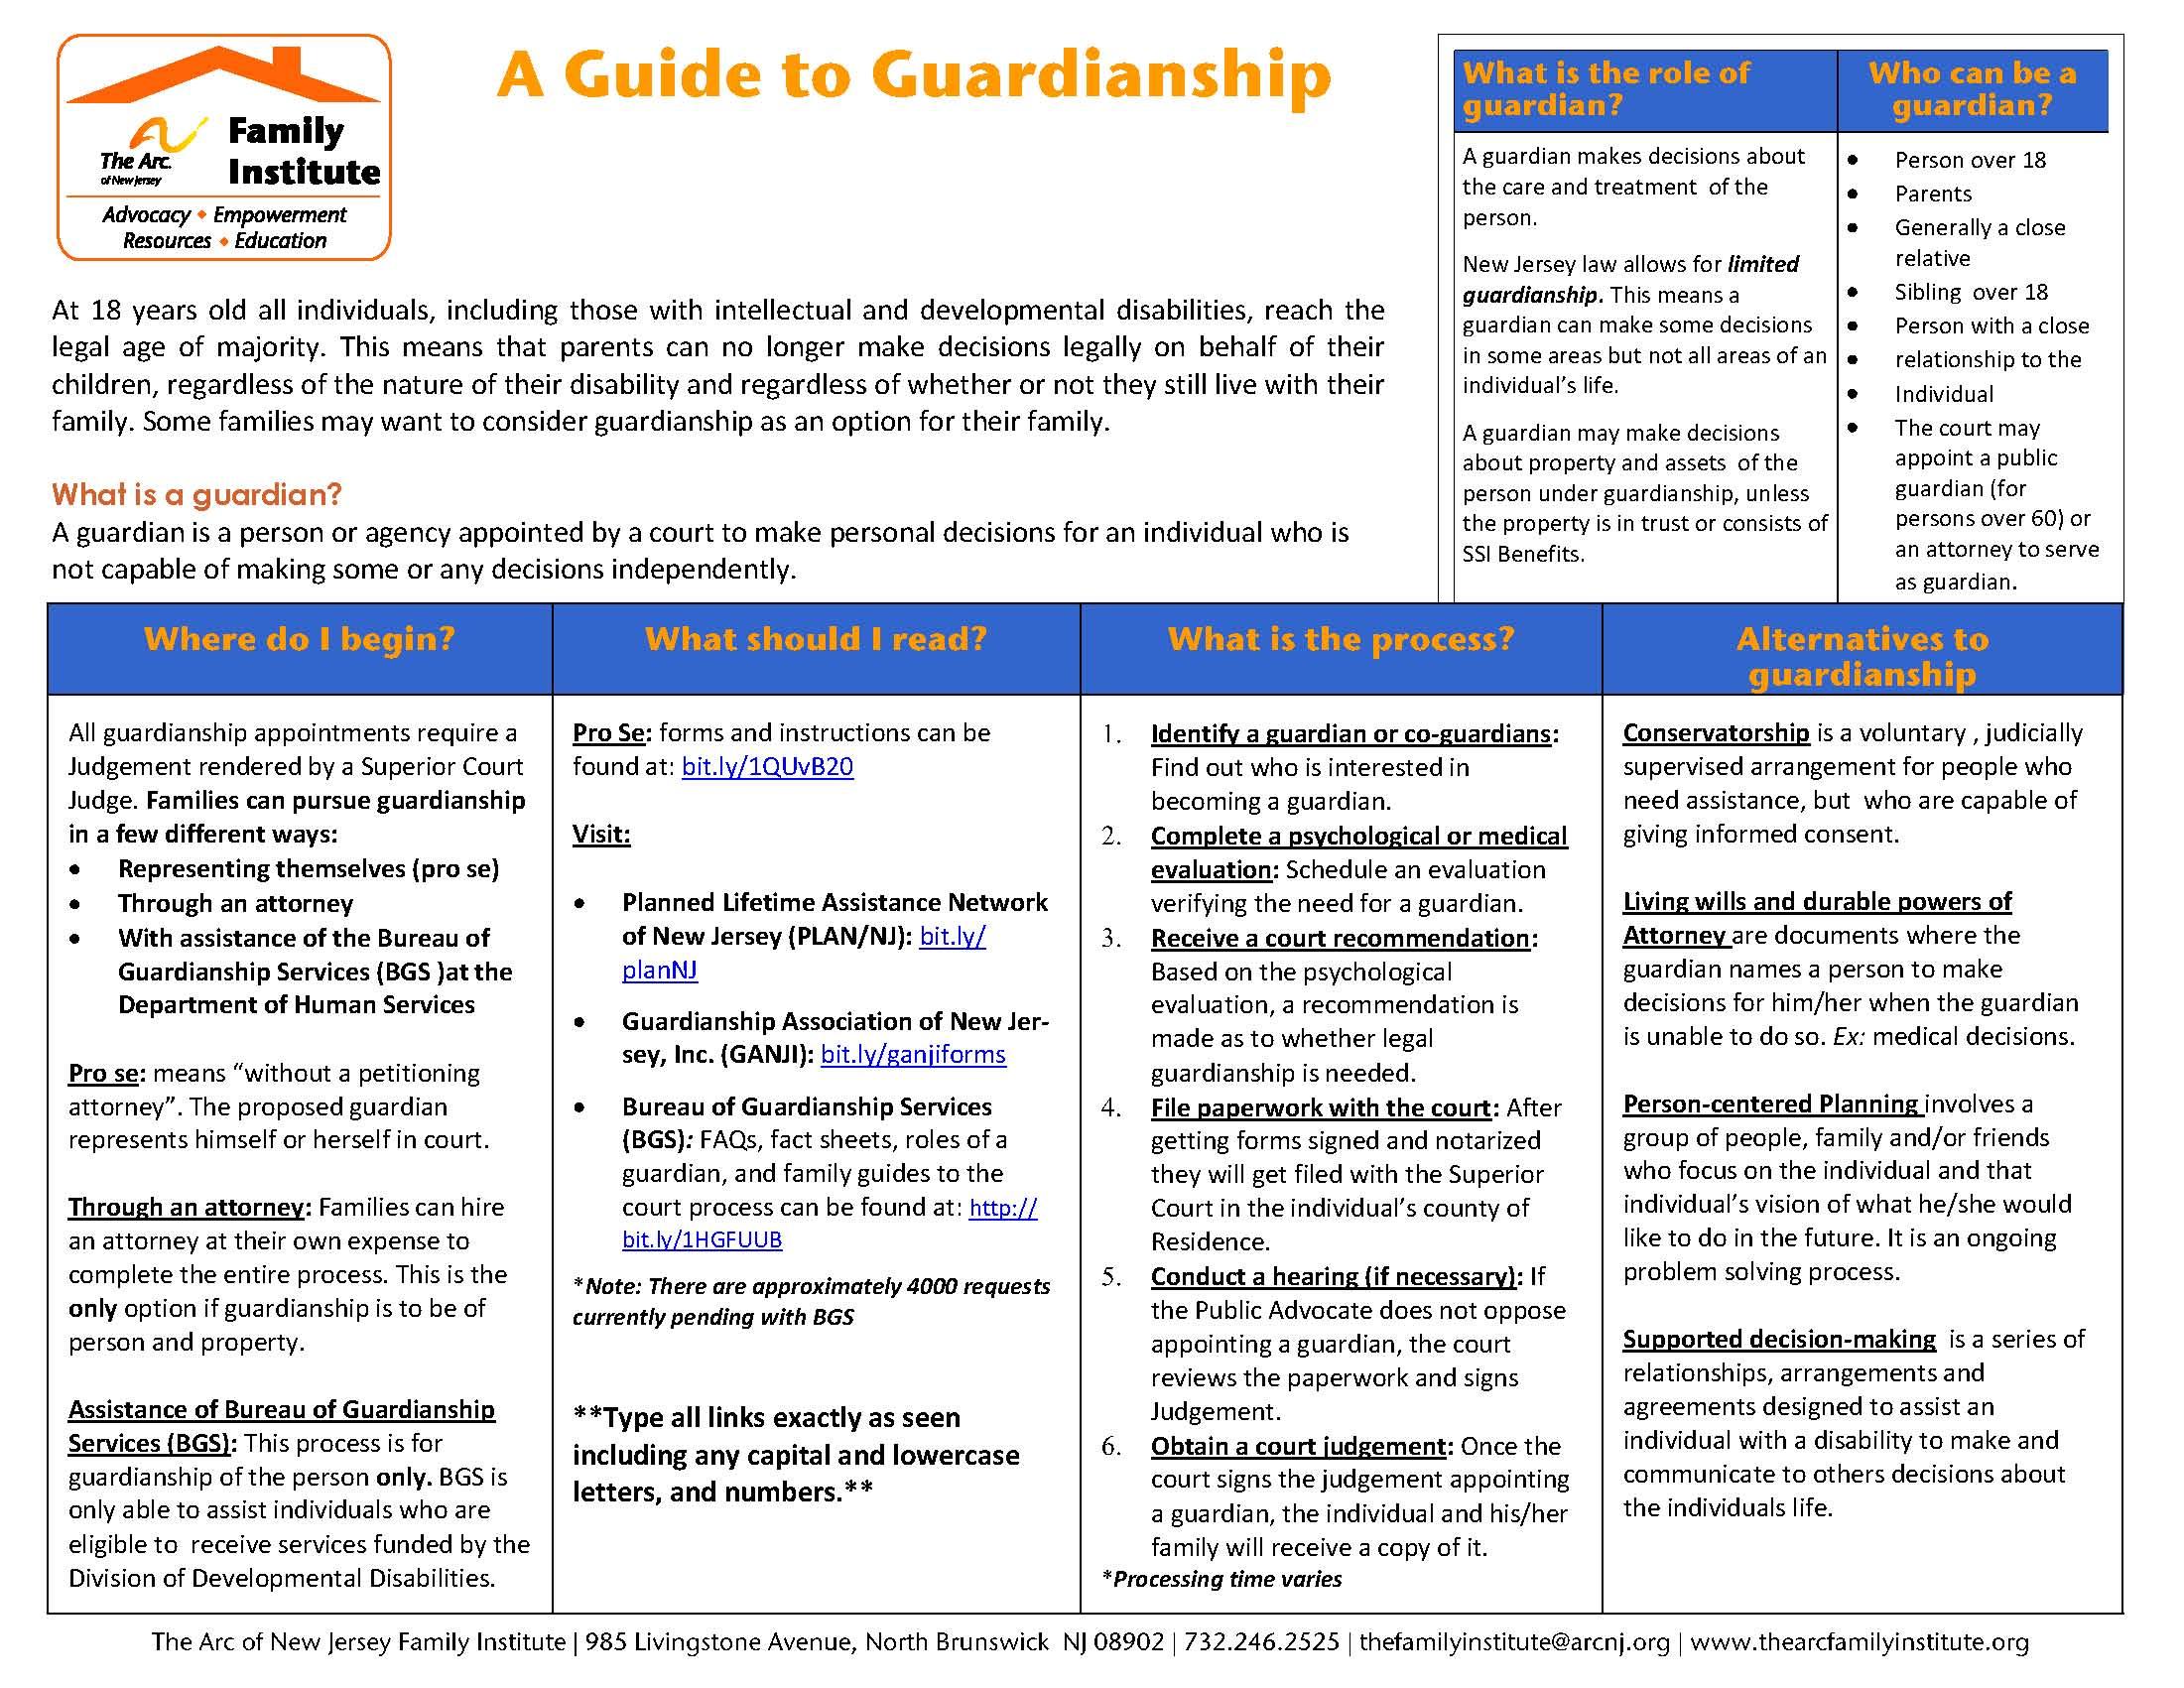 Understanding Guardianship & Alternative Options